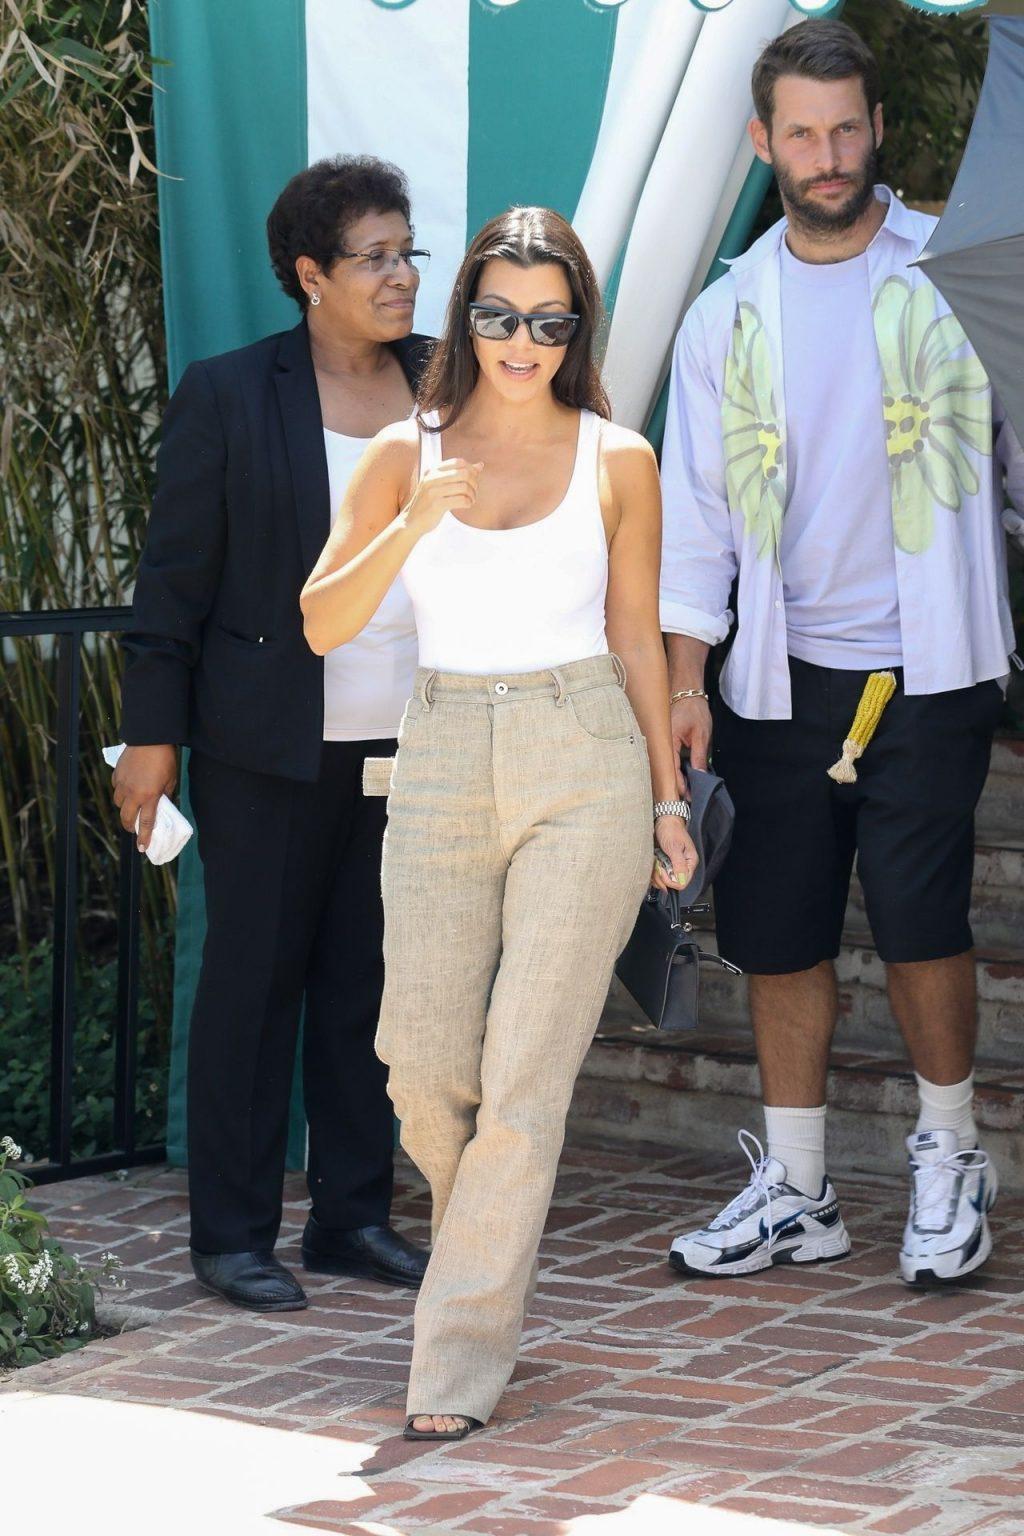 Kourtney Kardashian See Through Thefappeningblog Com 43 1024